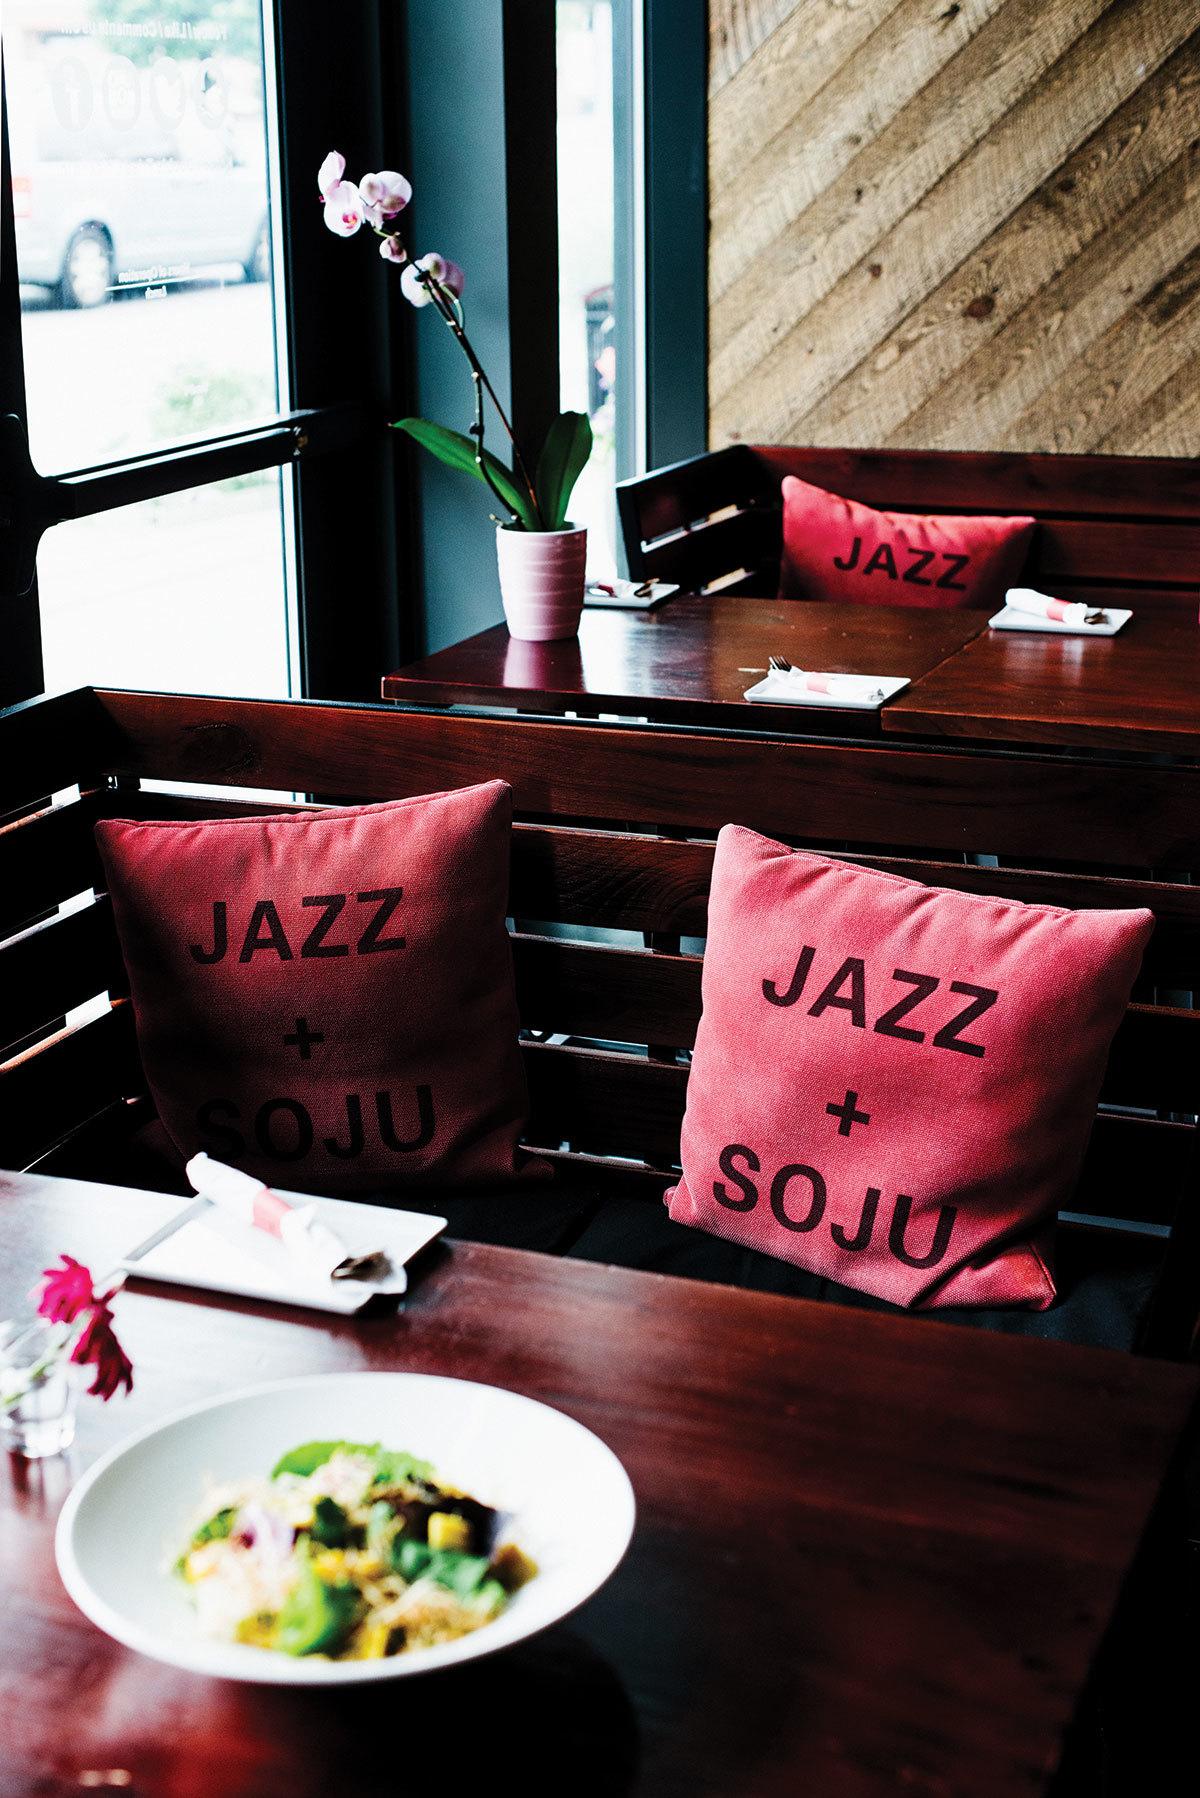 JazzAndSoju-15.jpg#asset:67024